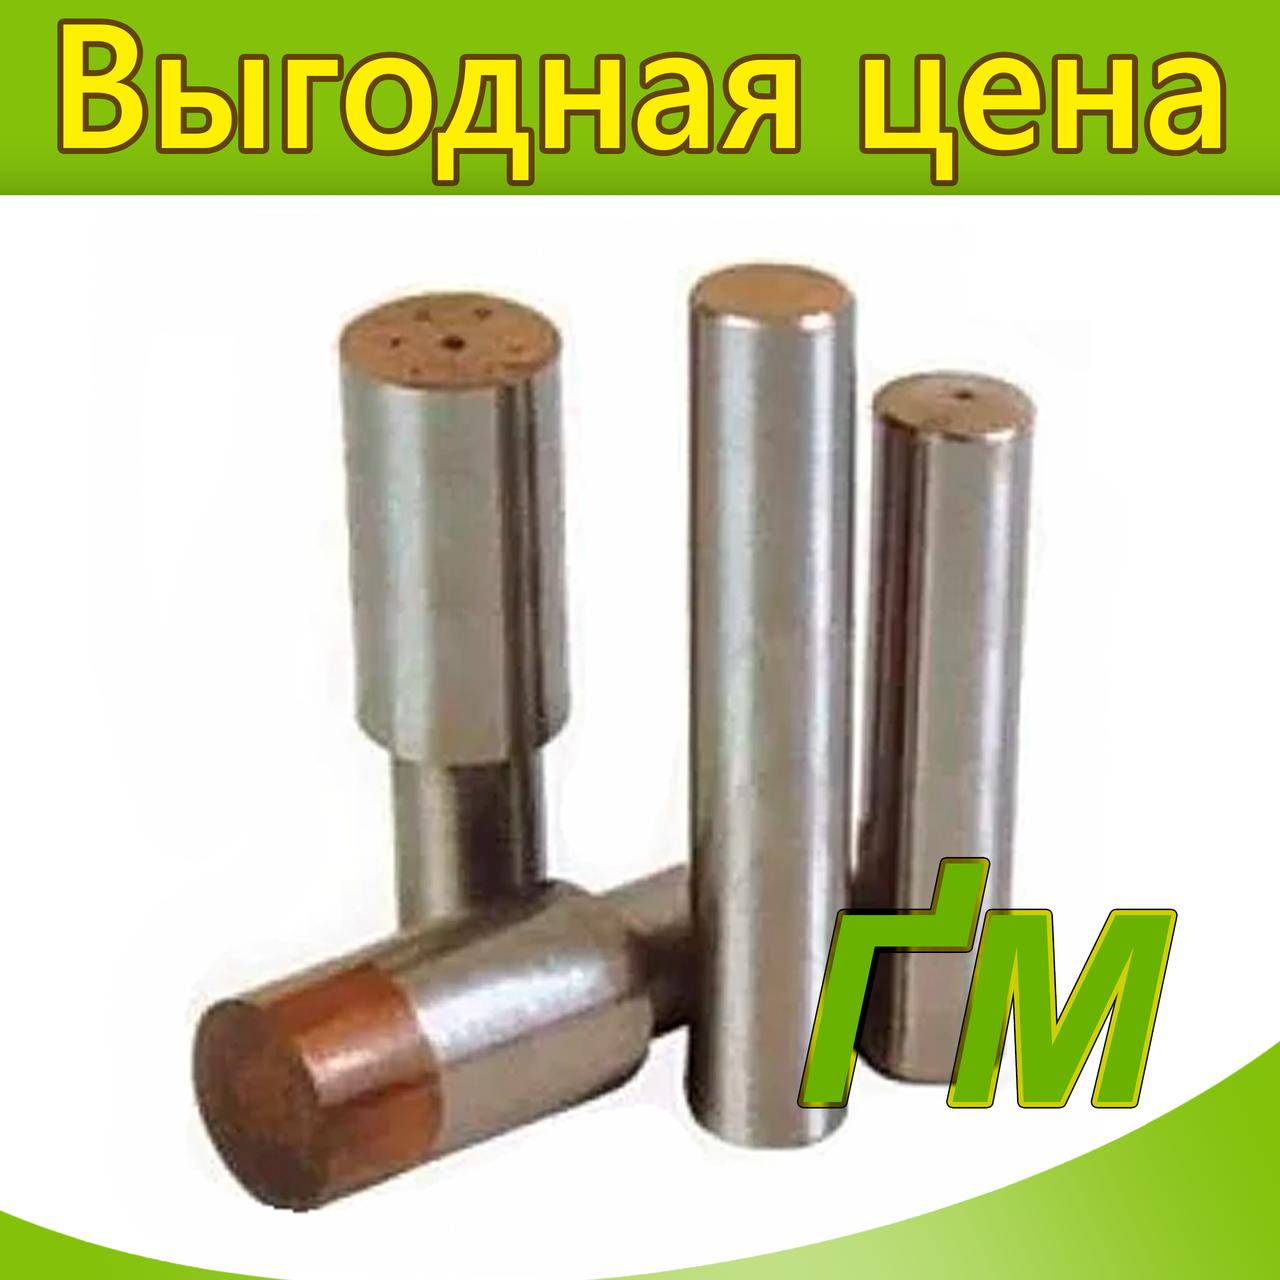 "Карандаш алмазный ""Славутич"", тип 04 Н, 1,45 карат (Винница)"